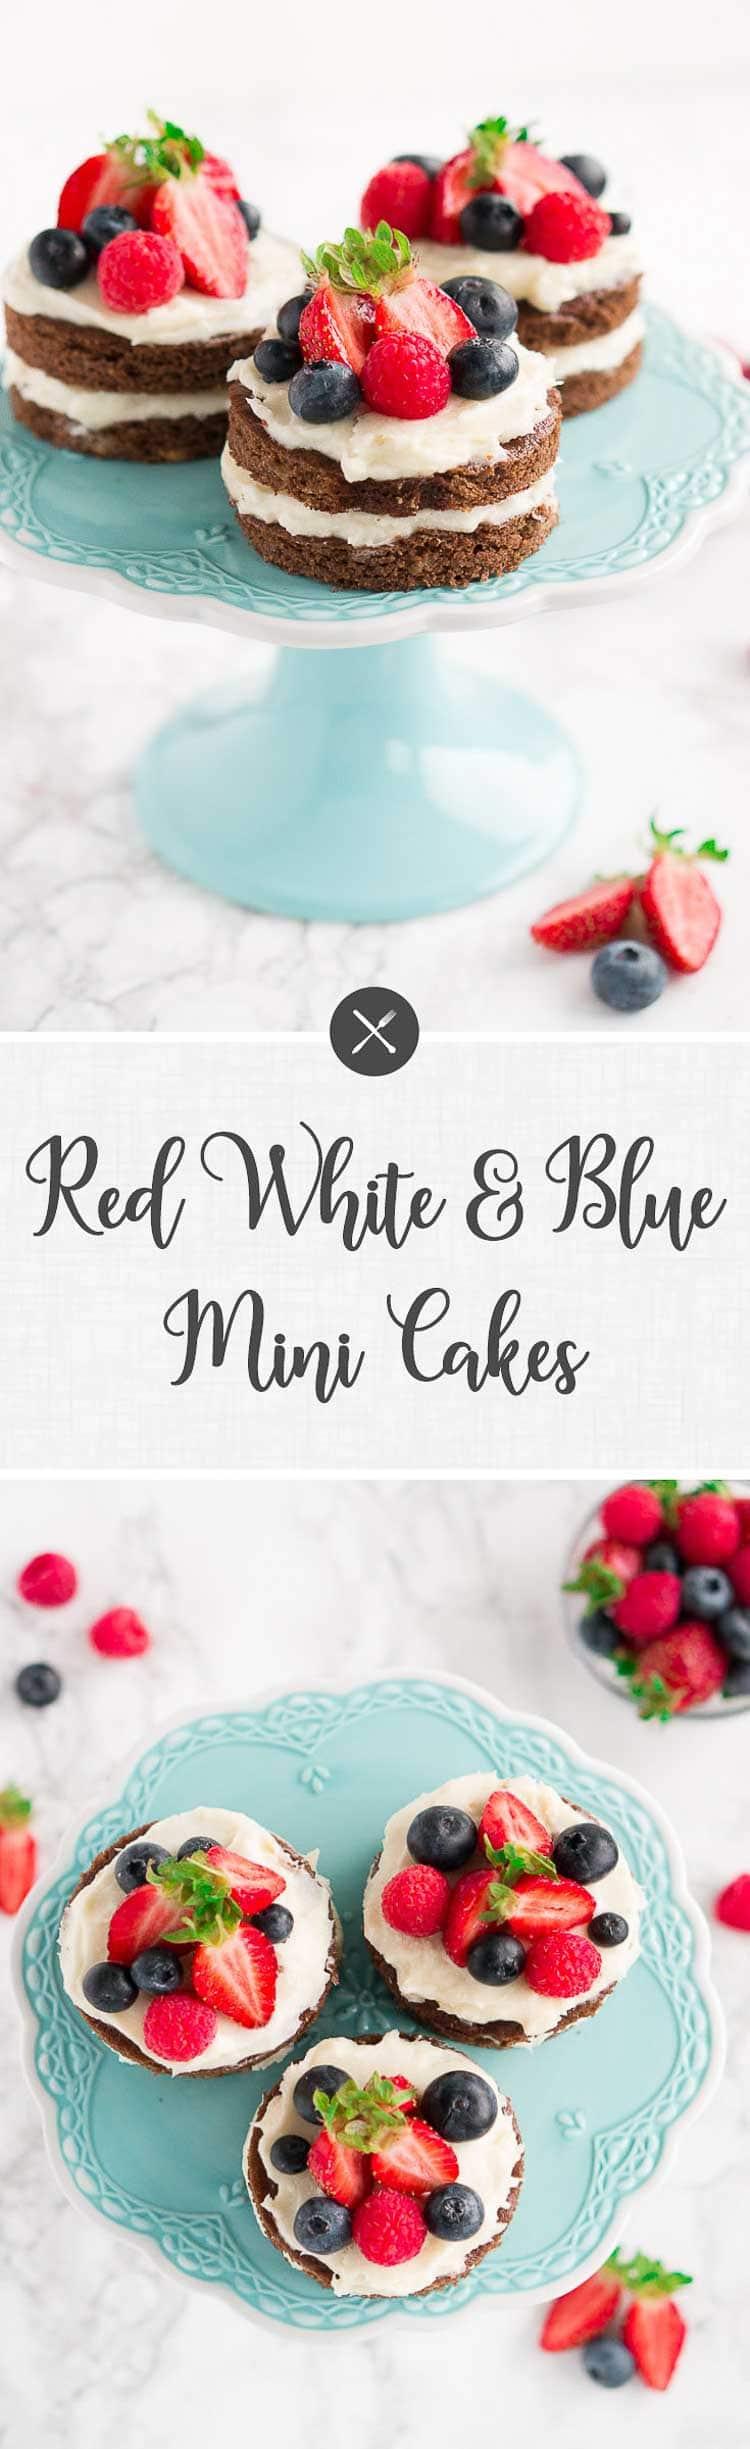 Red White and Blue Mini Cakes (Gluten-Free, Paleo)